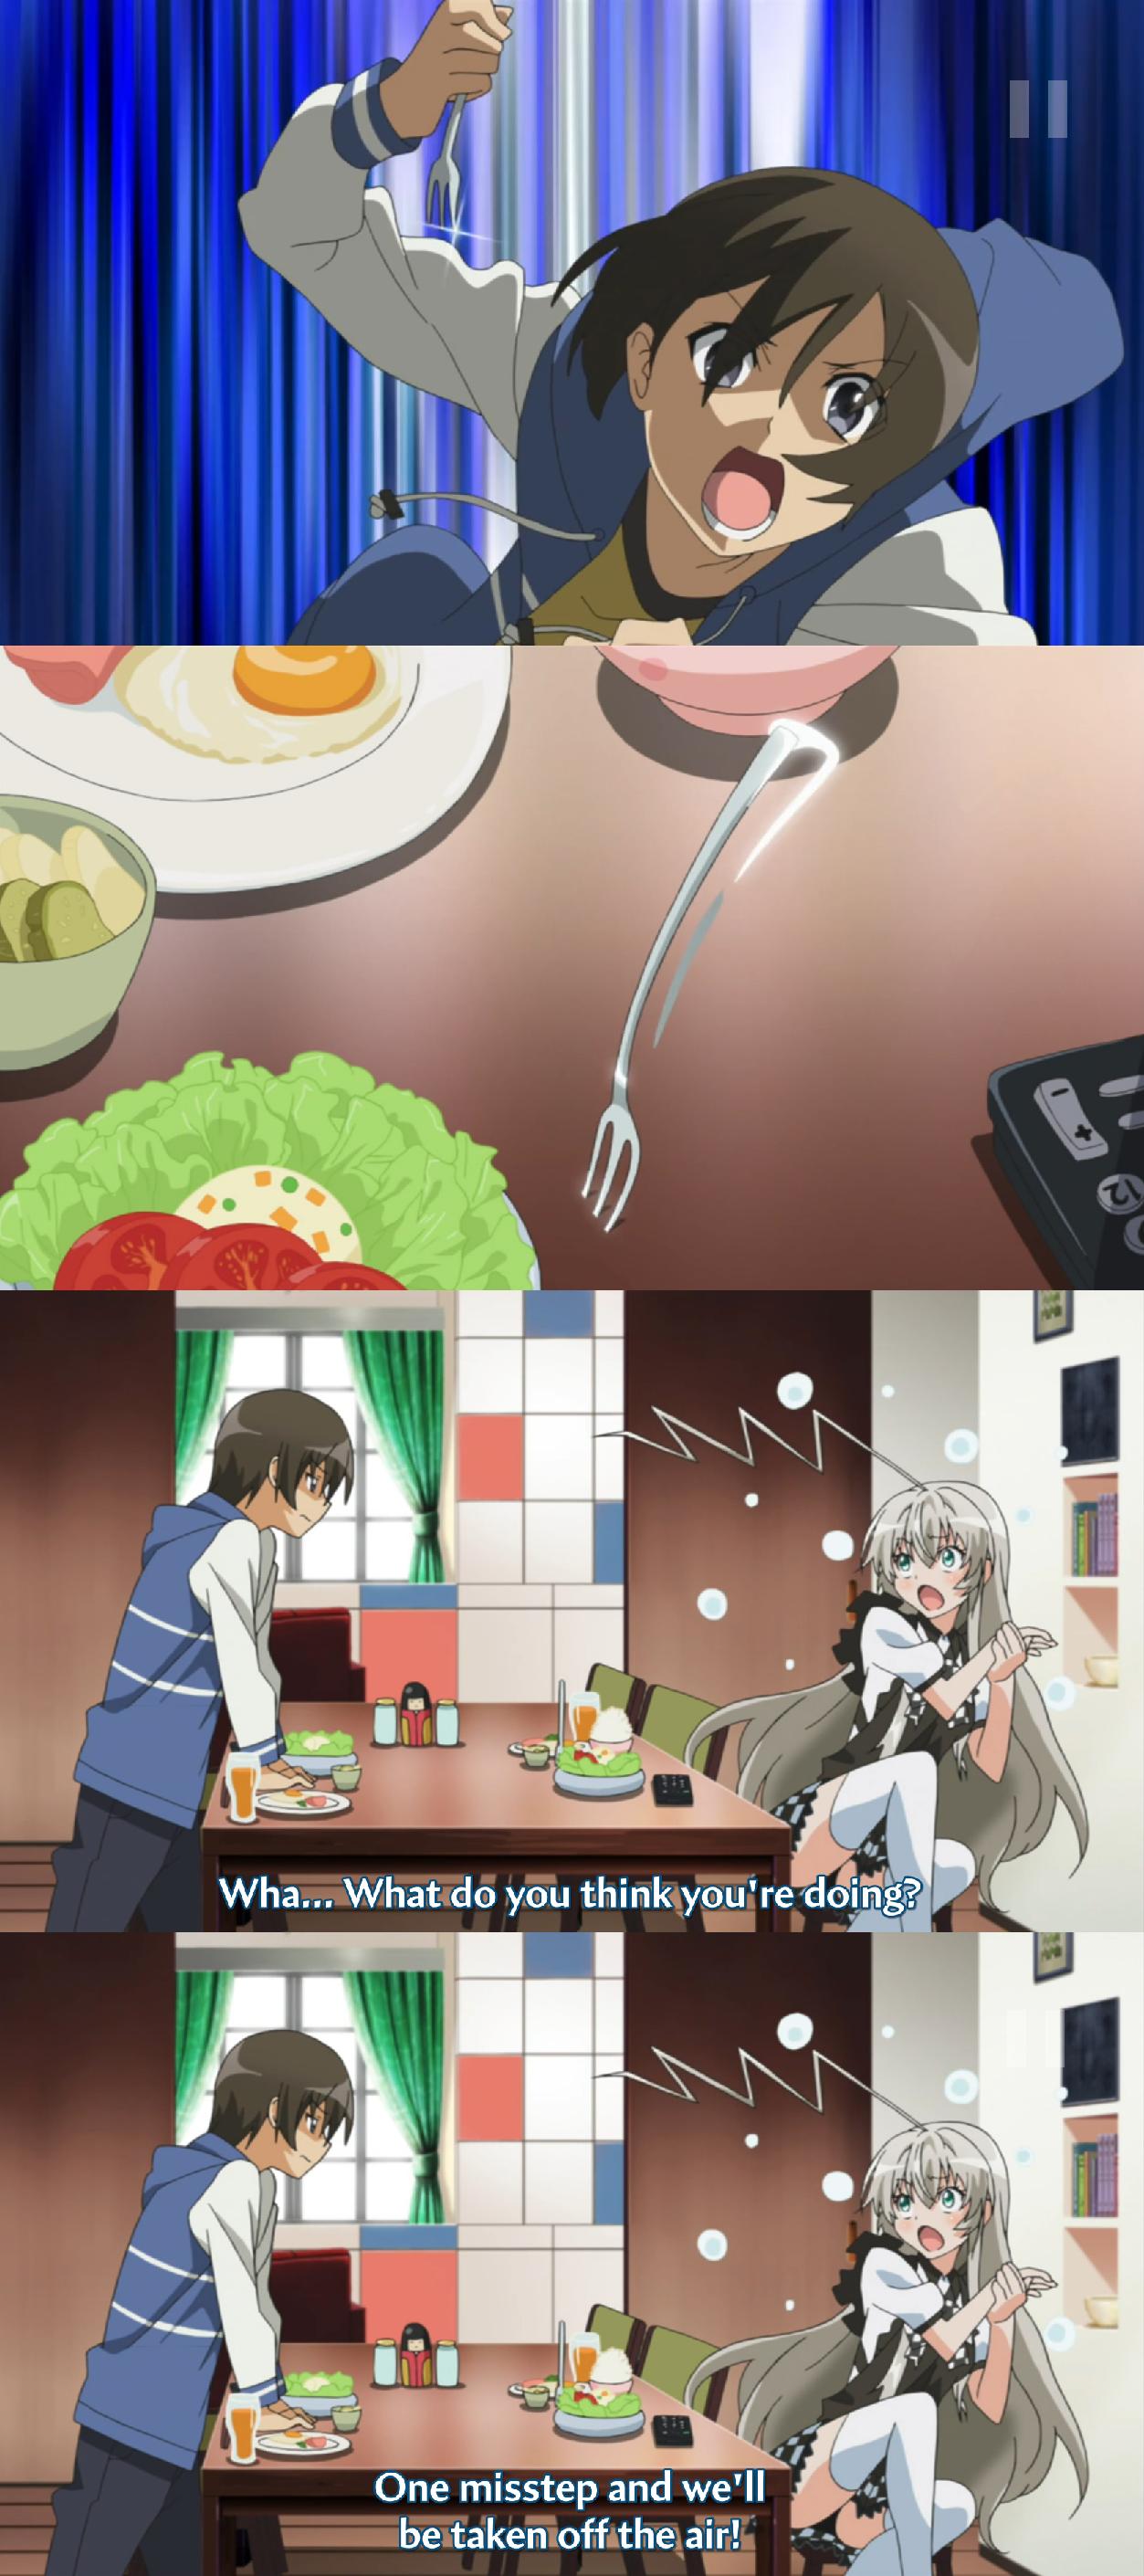 Breaking the 4th wall. source is Haiyore! Nyaruko-san. 4th Wall fork stab